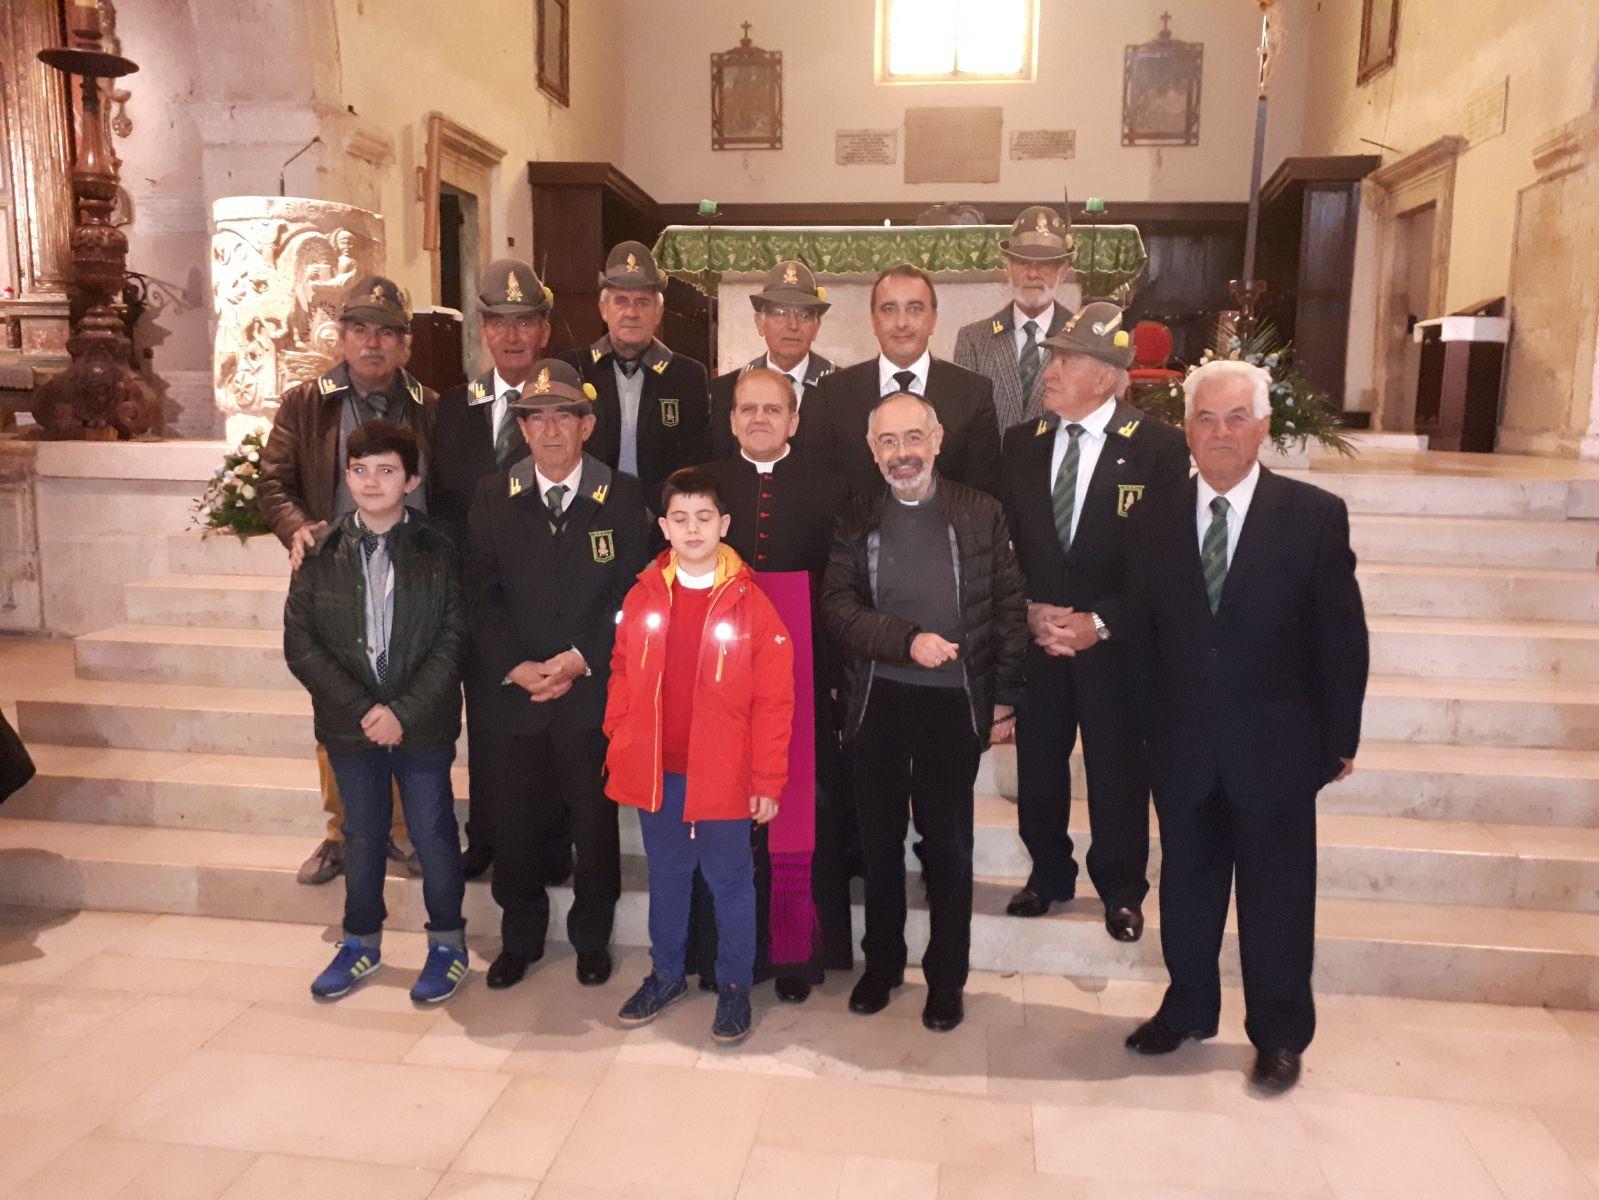 Trasacco: Mons. Gabriele Teti Celebra Santa Messa presieduta dall'Associazione Nazionale Finanzieri D'Italia